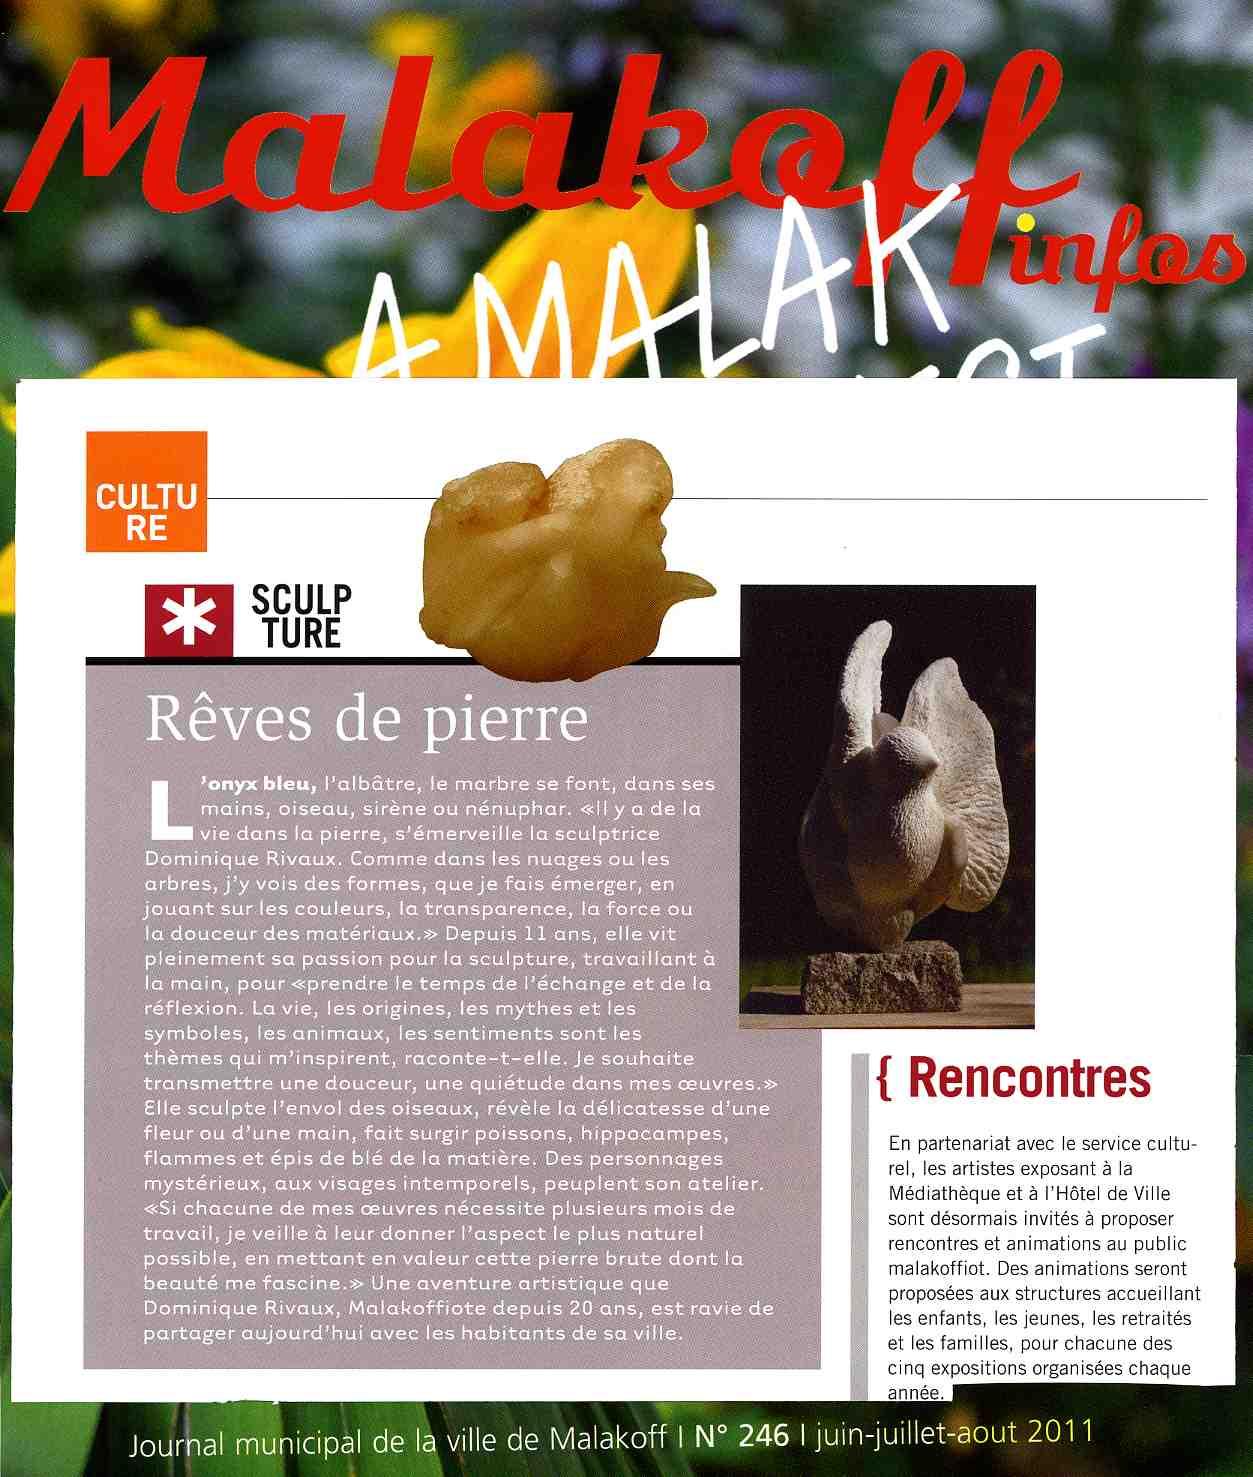 Article - Mairie de Malakoff - Malakoff Infos 2011